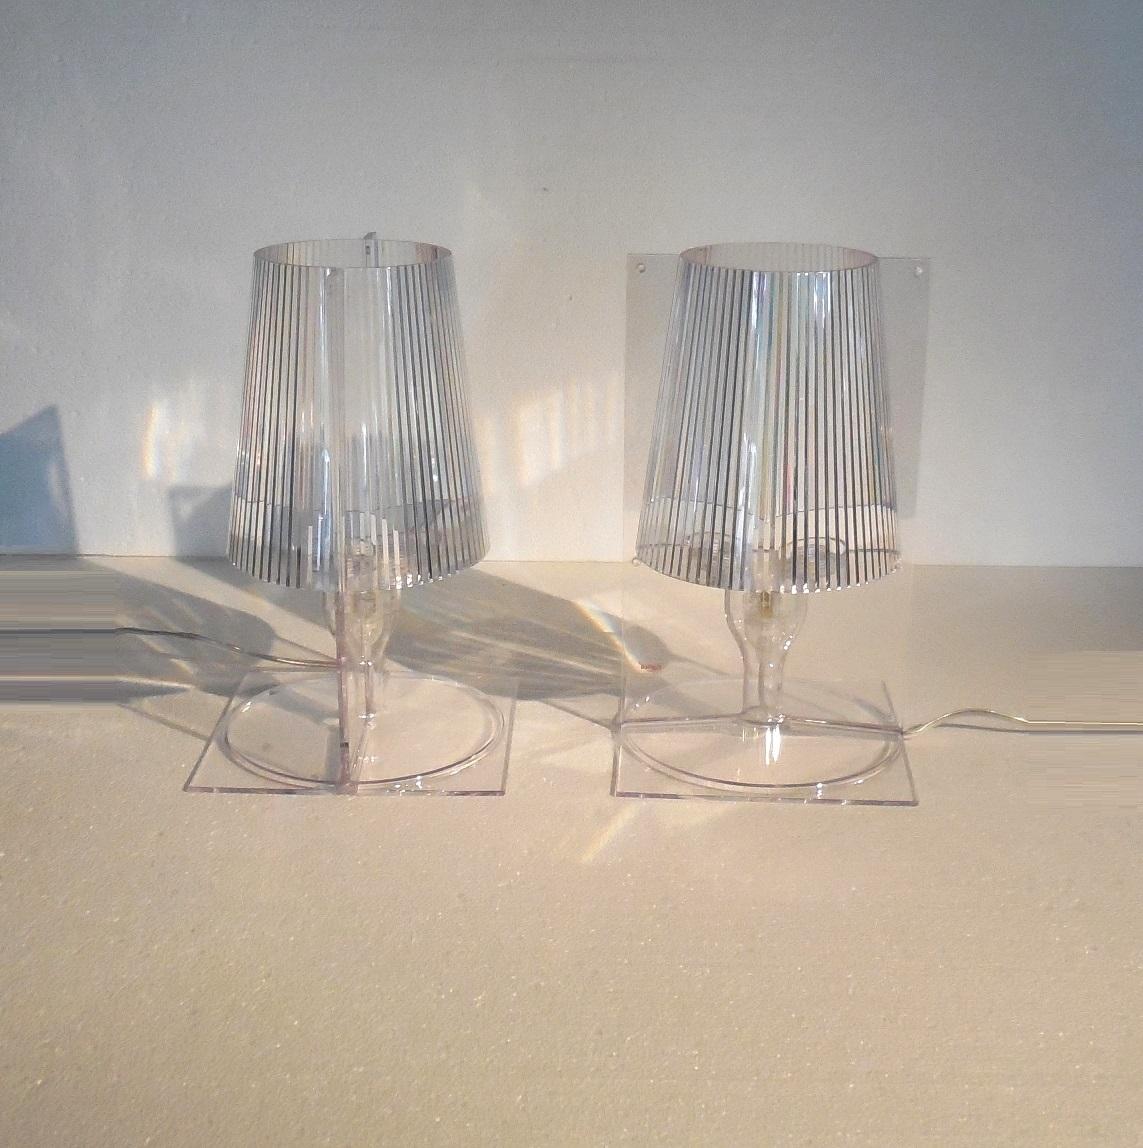 Lampade a muro moderne - Lampade kartell da tavolo ...